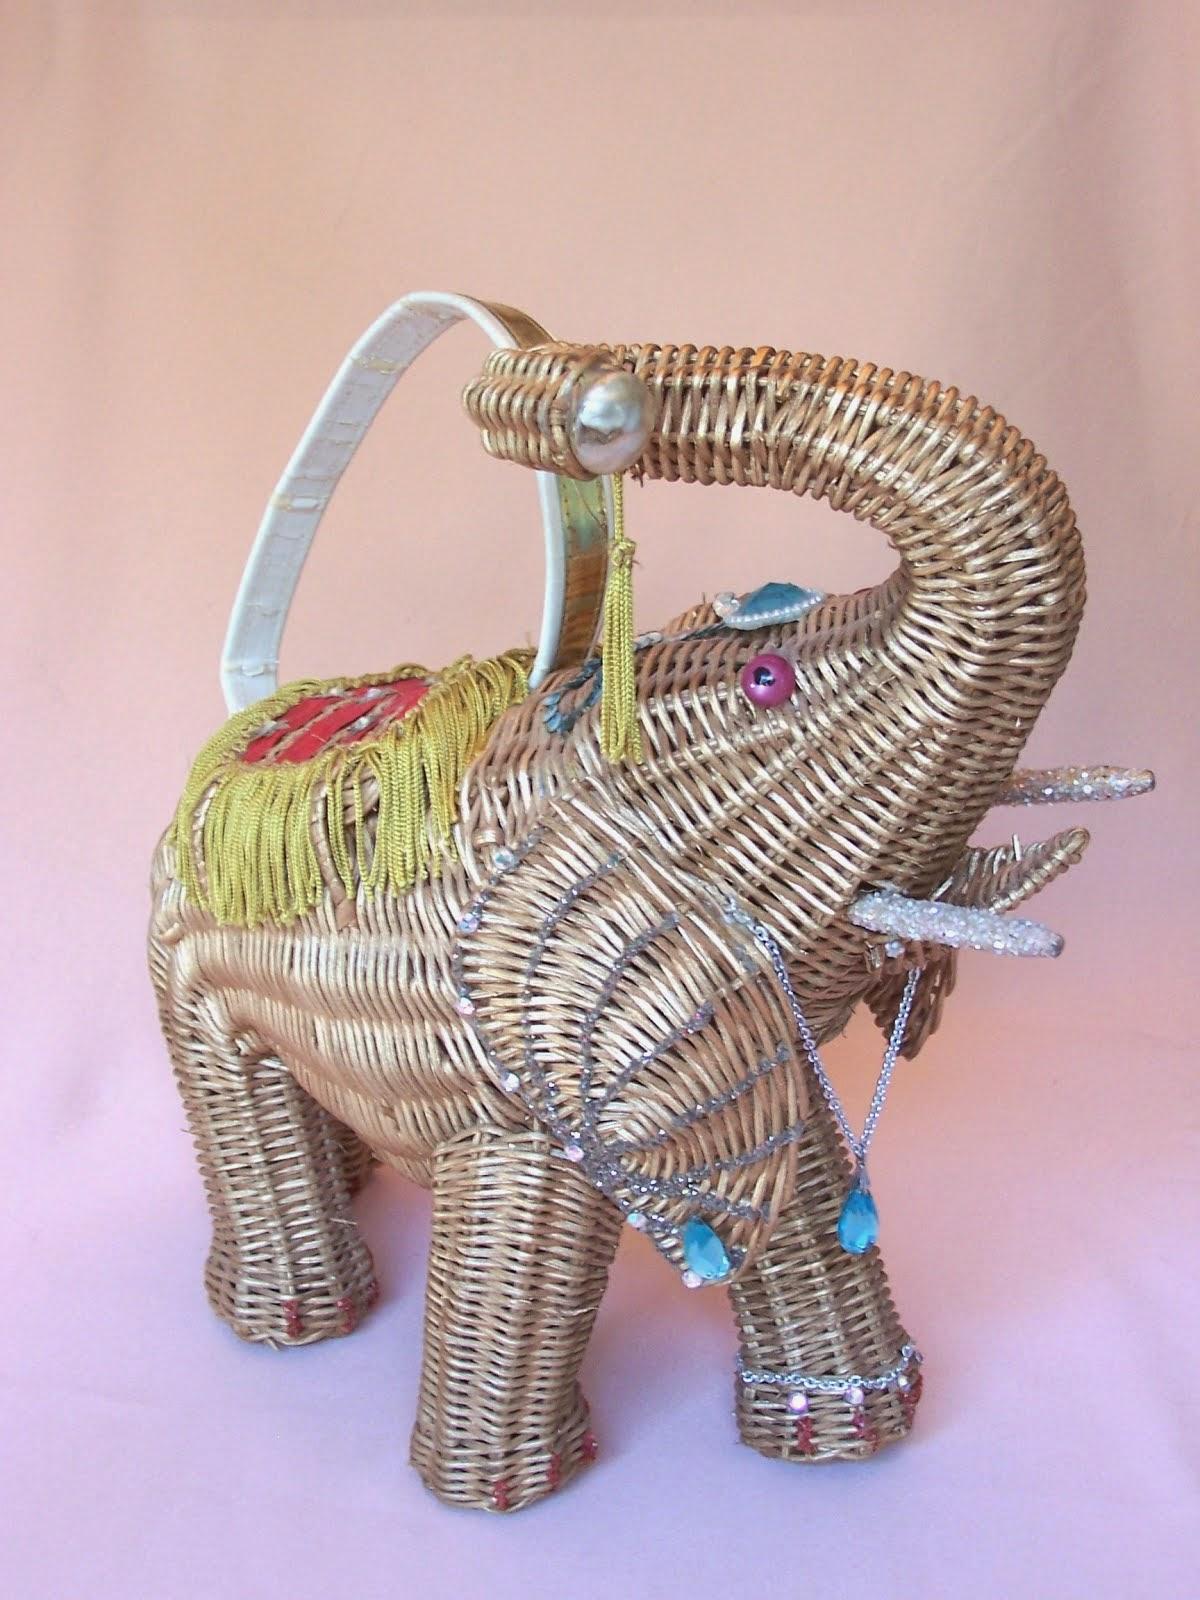 Midas of Miami Wicker Elephant Purse